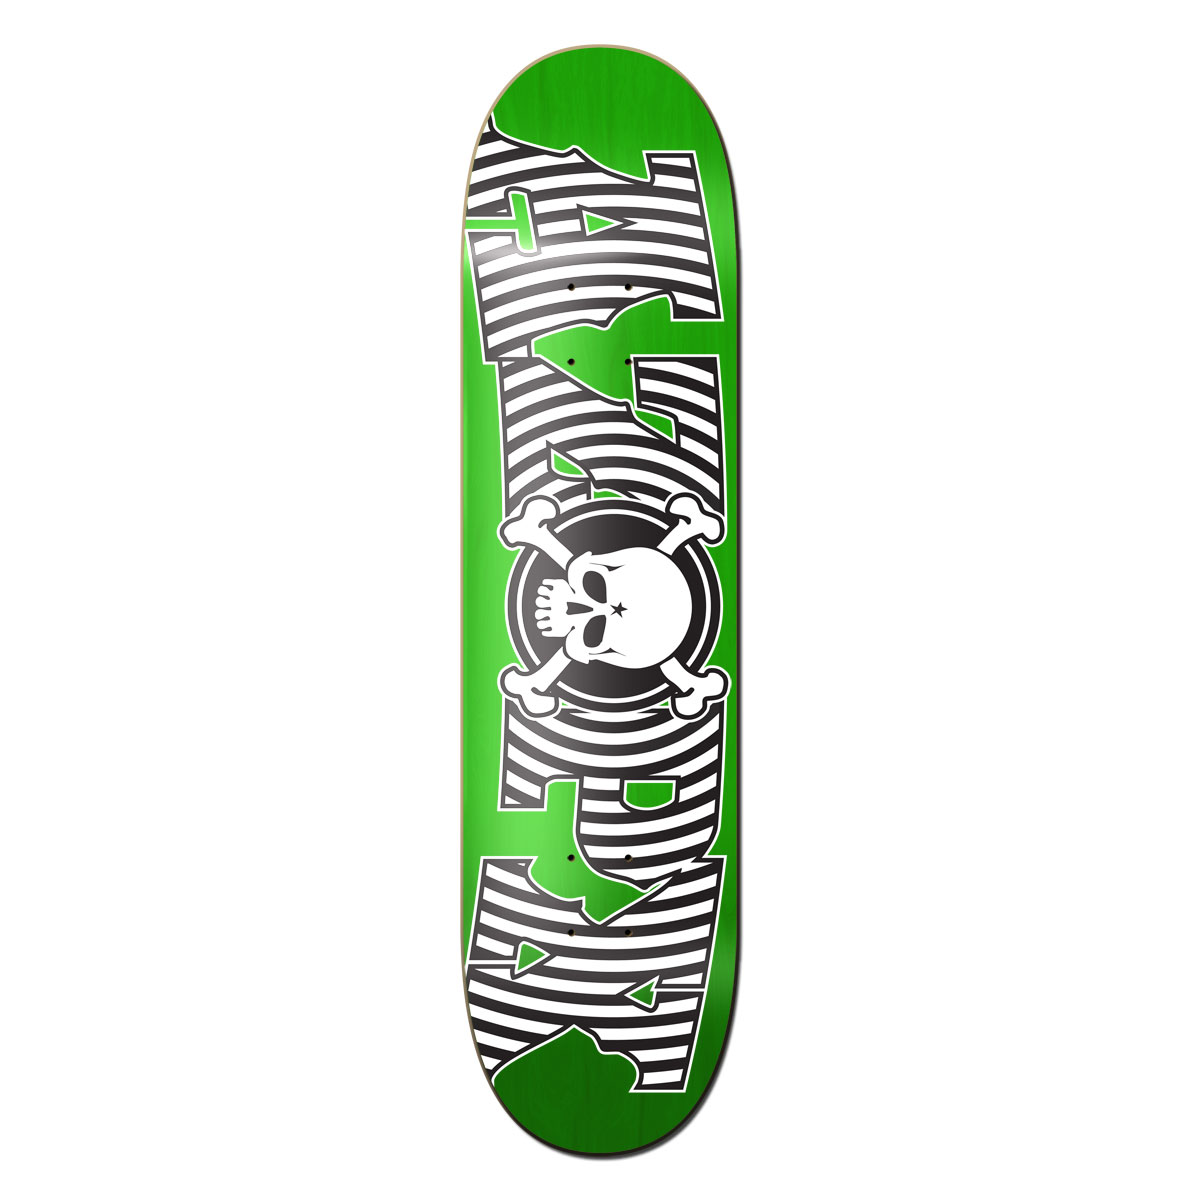 8.5″ AZPX Popsicle Deck